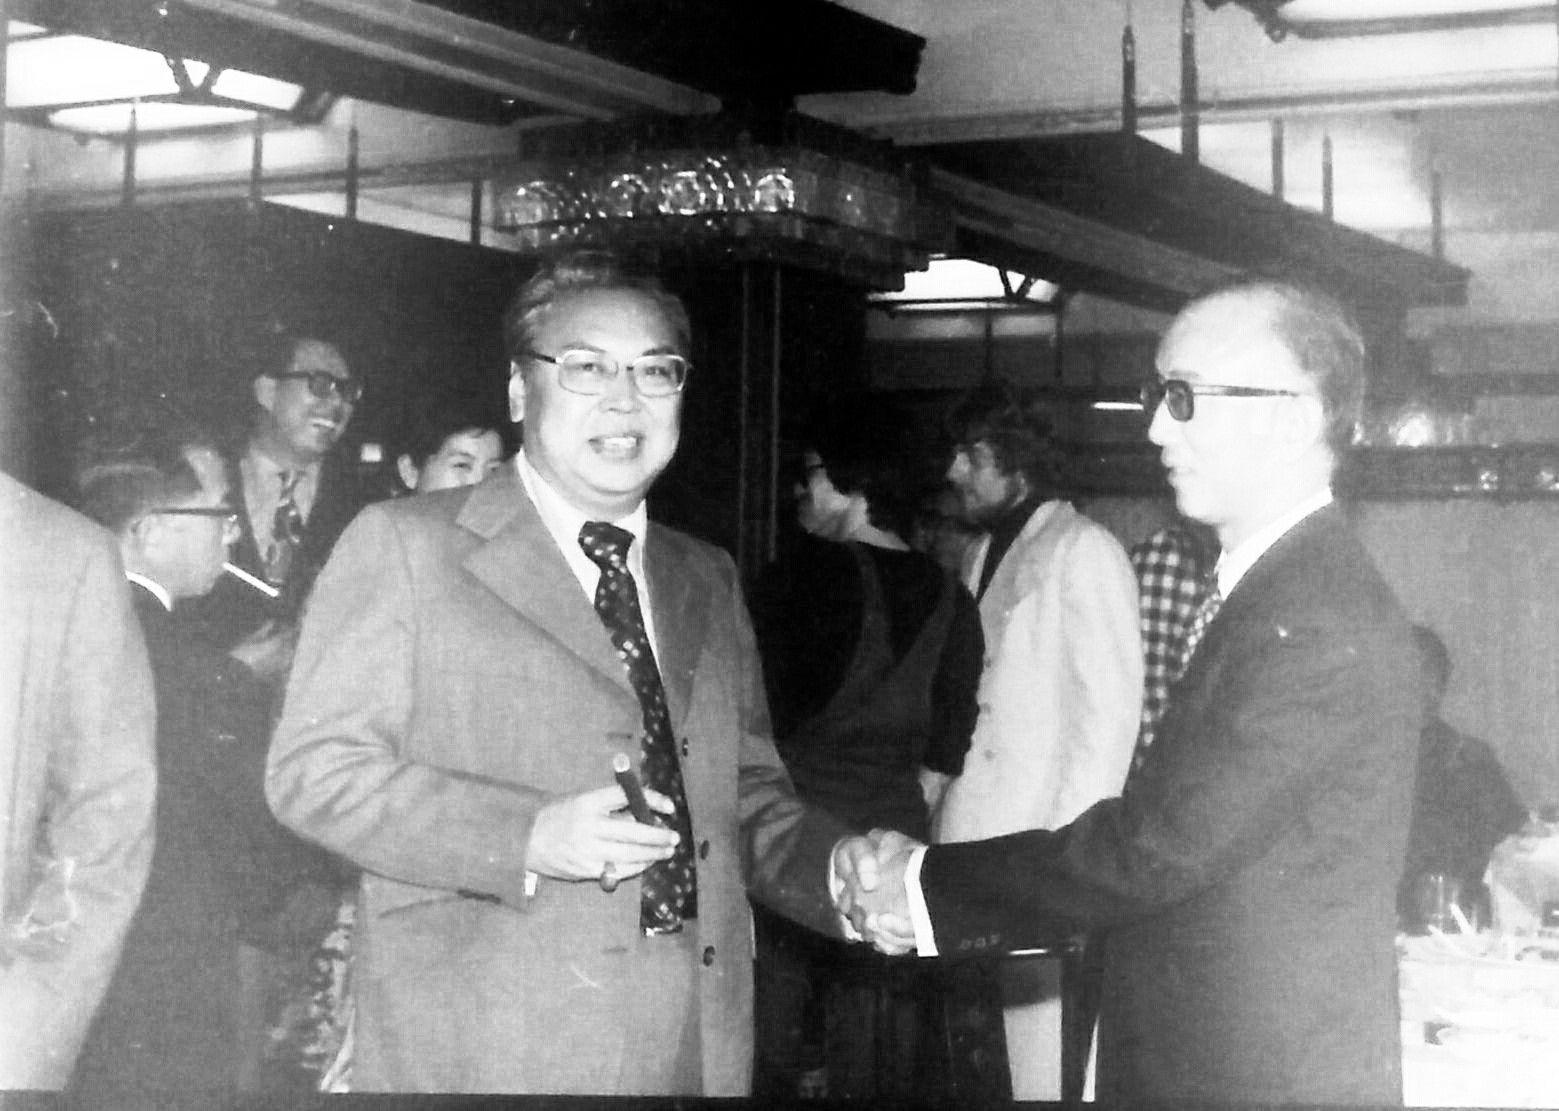 「1973・2 Chinese Lunar New Year Party」おしゃれまとめの人気アイデア